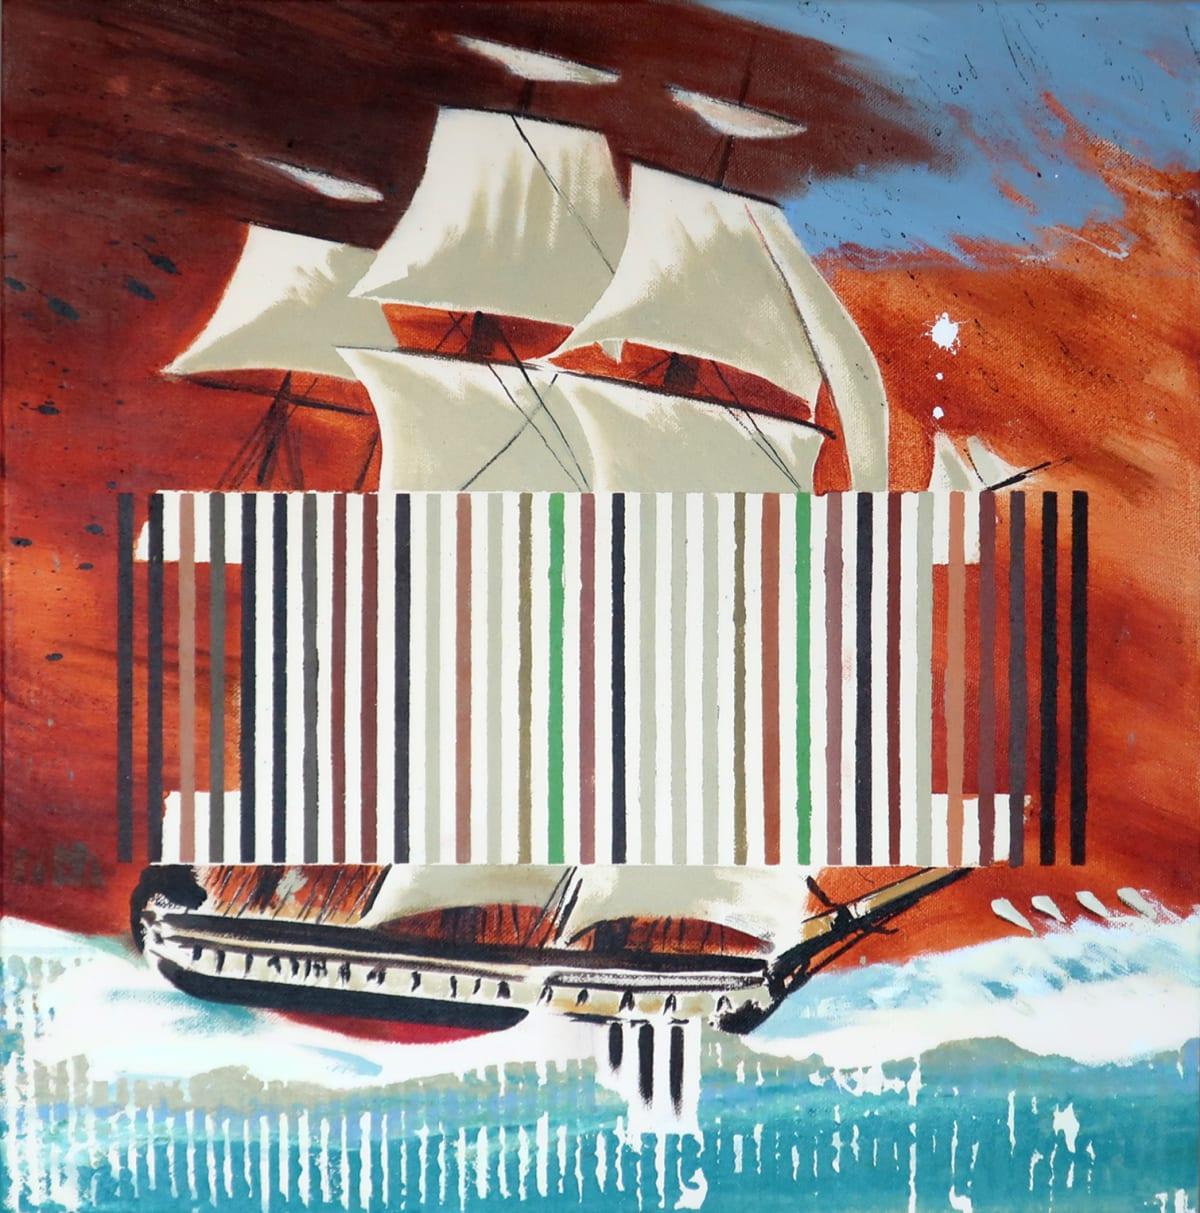 Darren Coffield The Flying Dutchman, 2019 Acrylic on canvas 40 x 40 cm